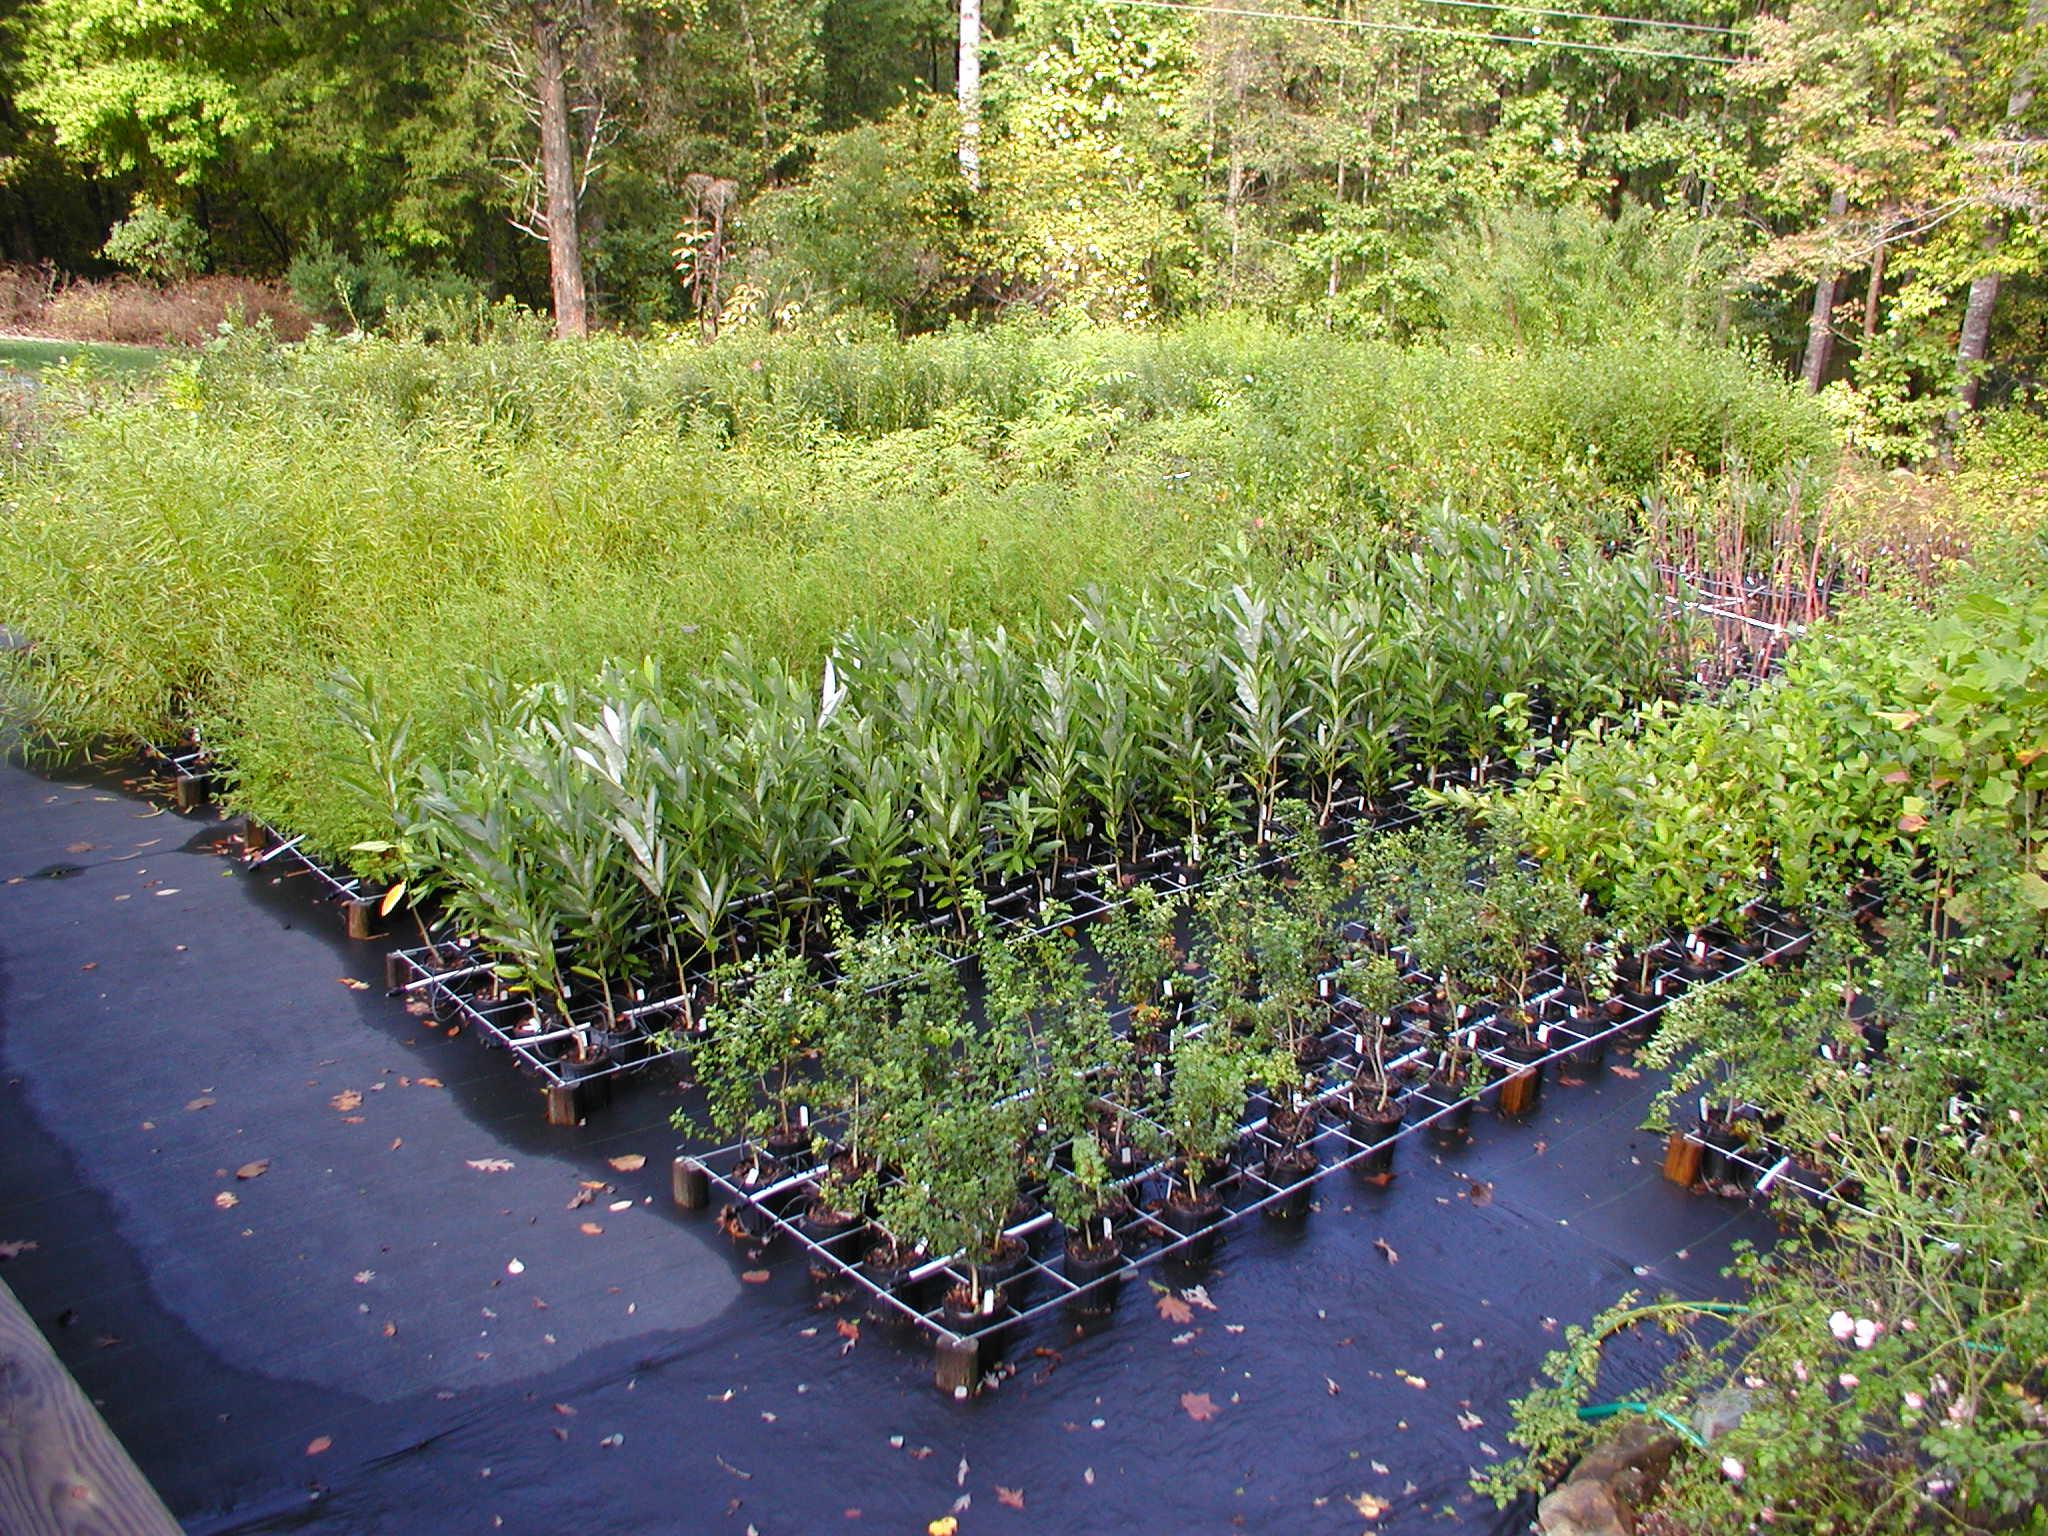 Image of native Piedmont plants